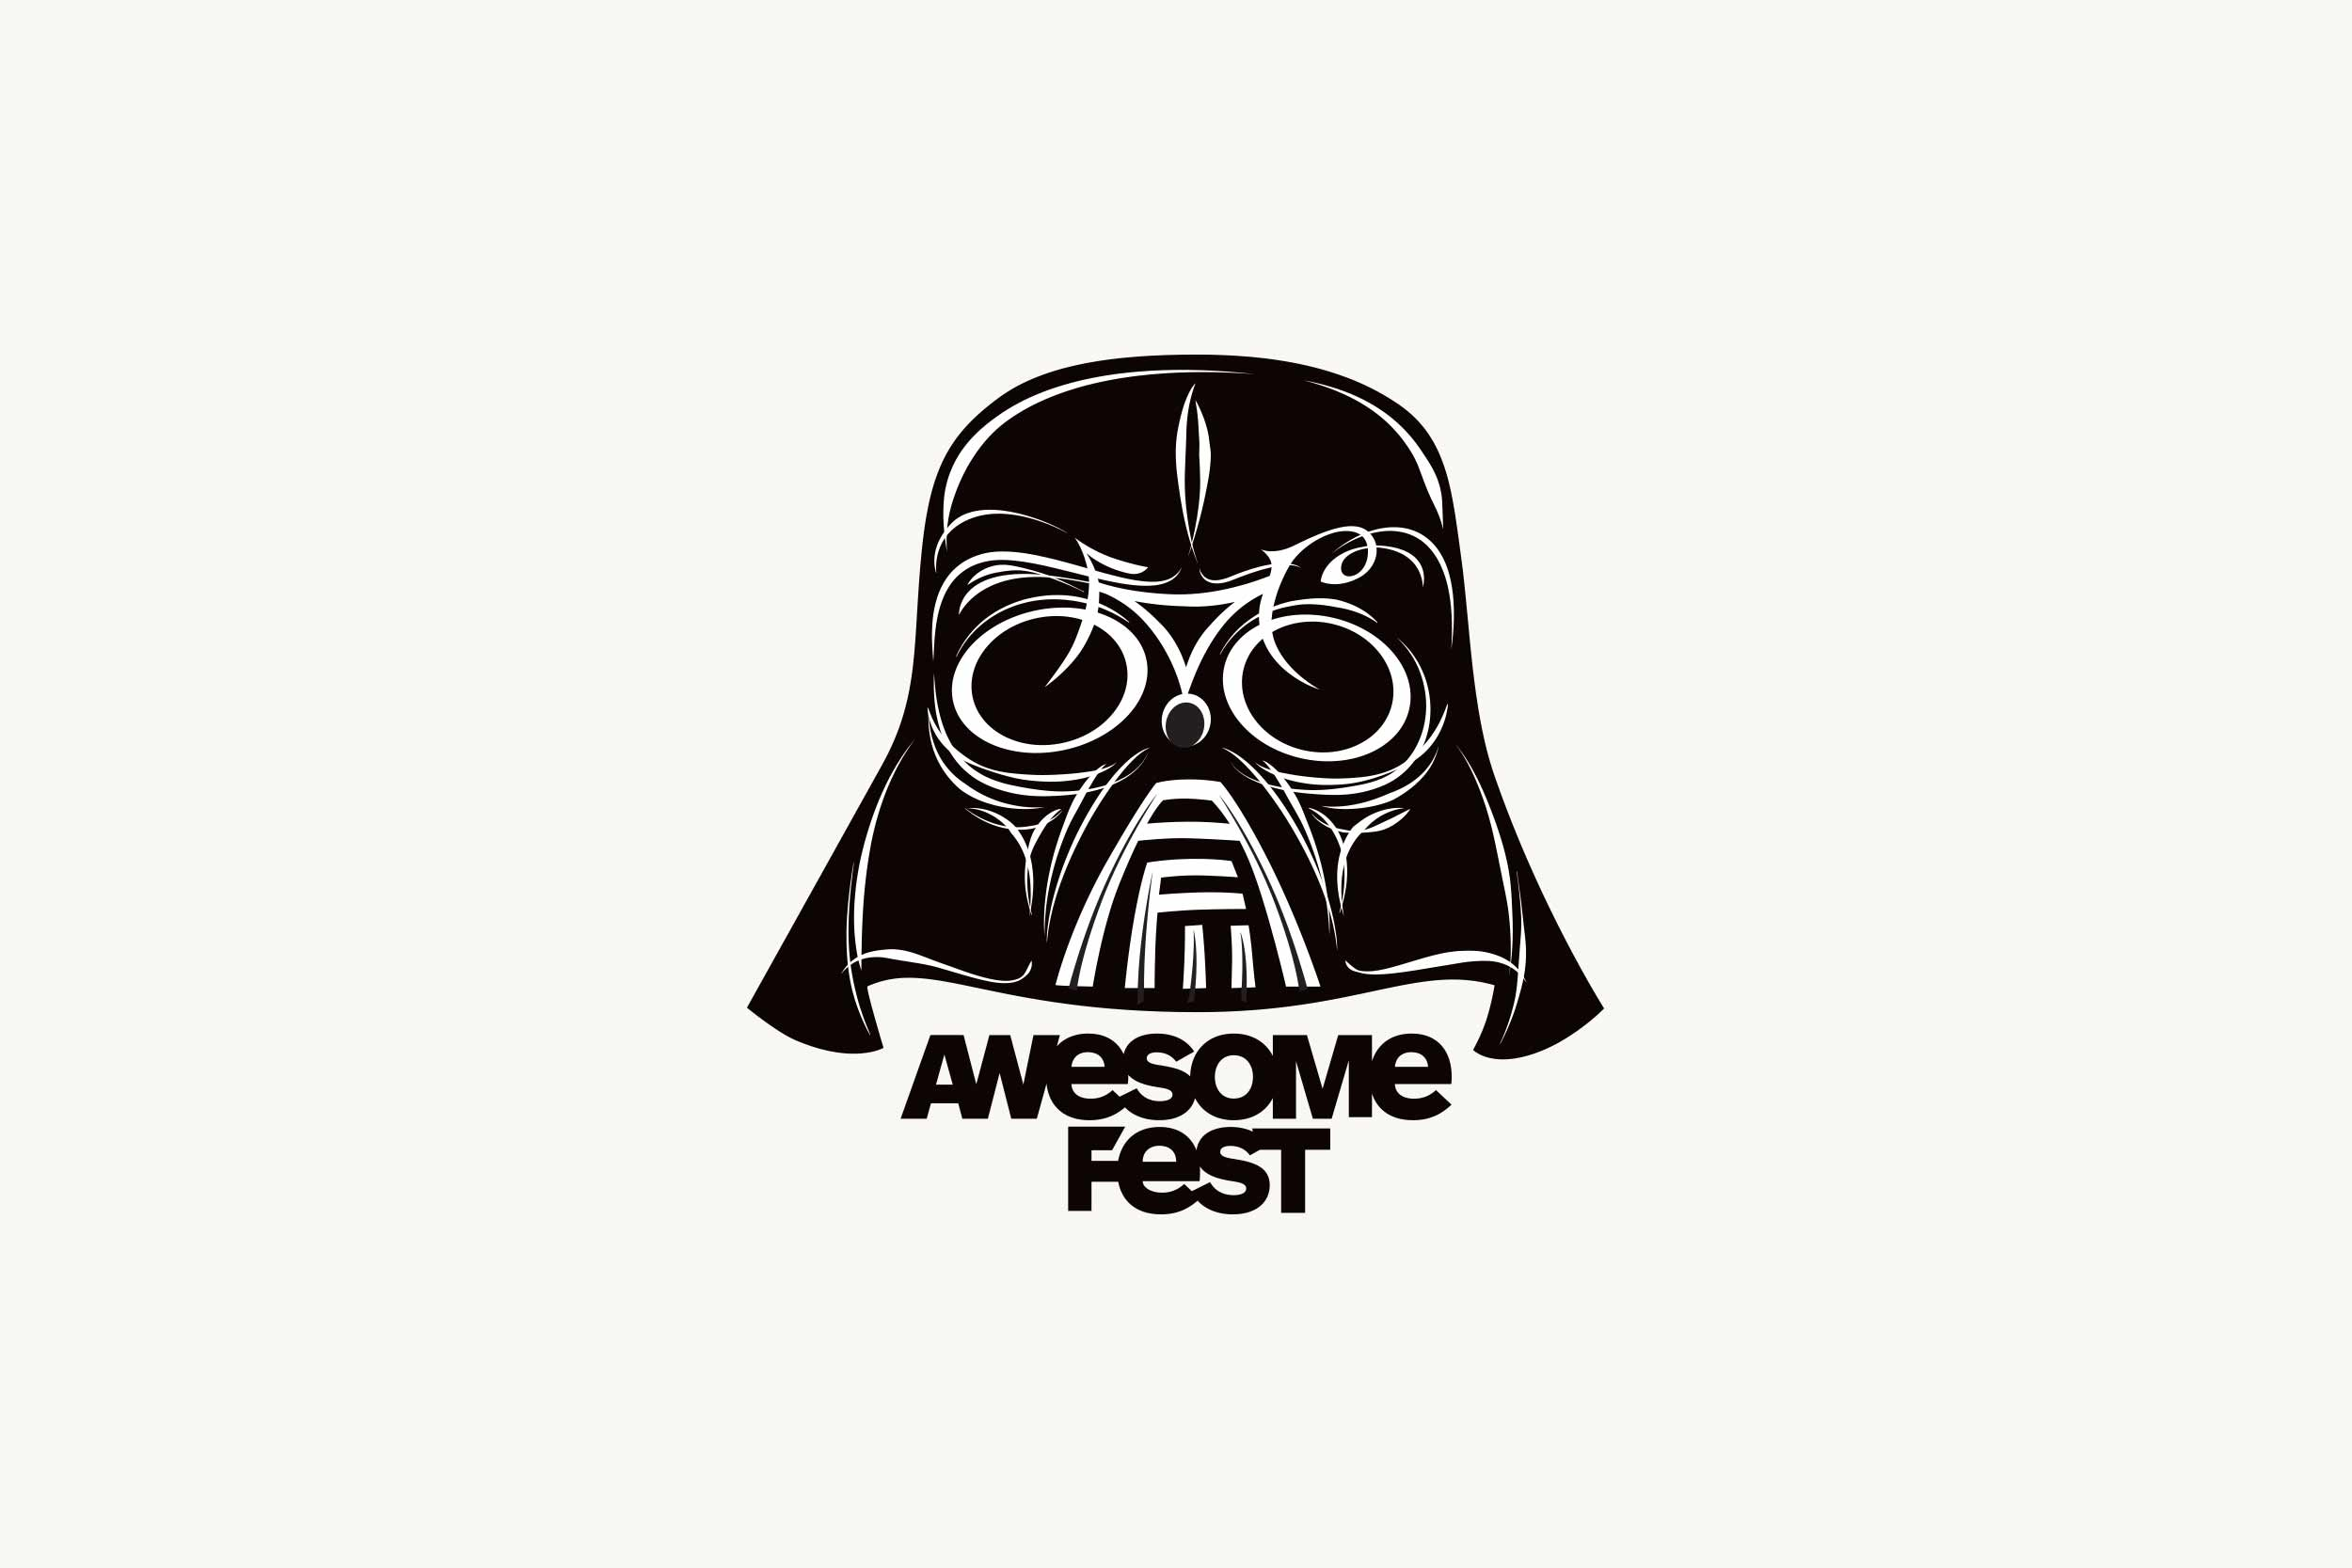 illo_awesomefest.jpg